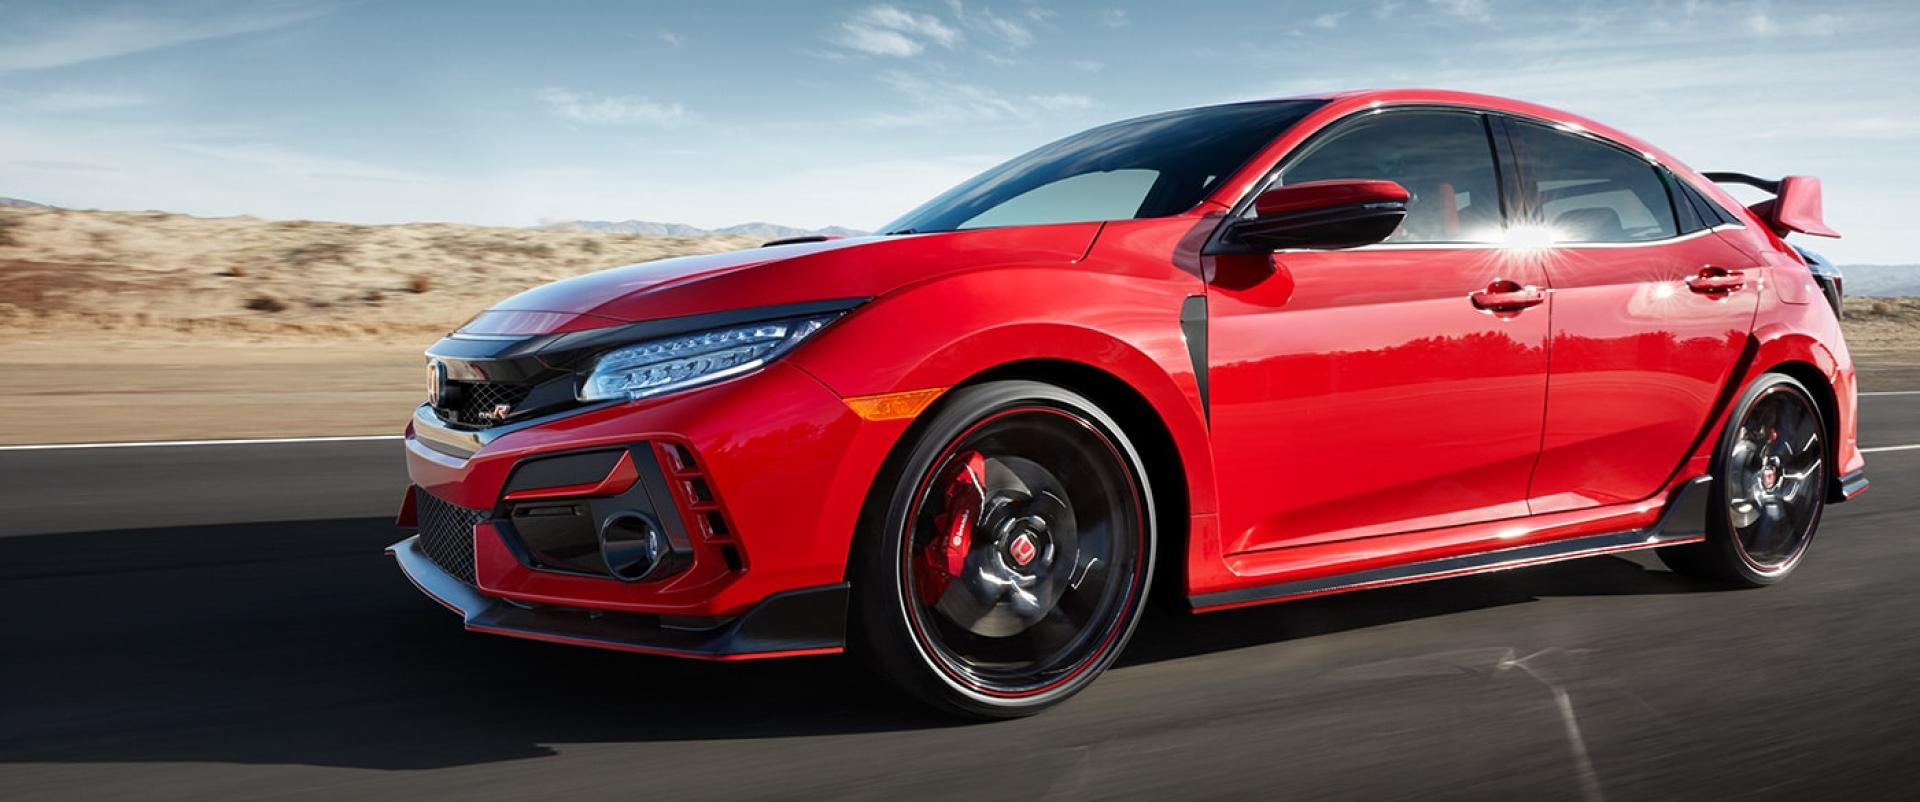 Honda_Civic_Type_R_Red_Driving